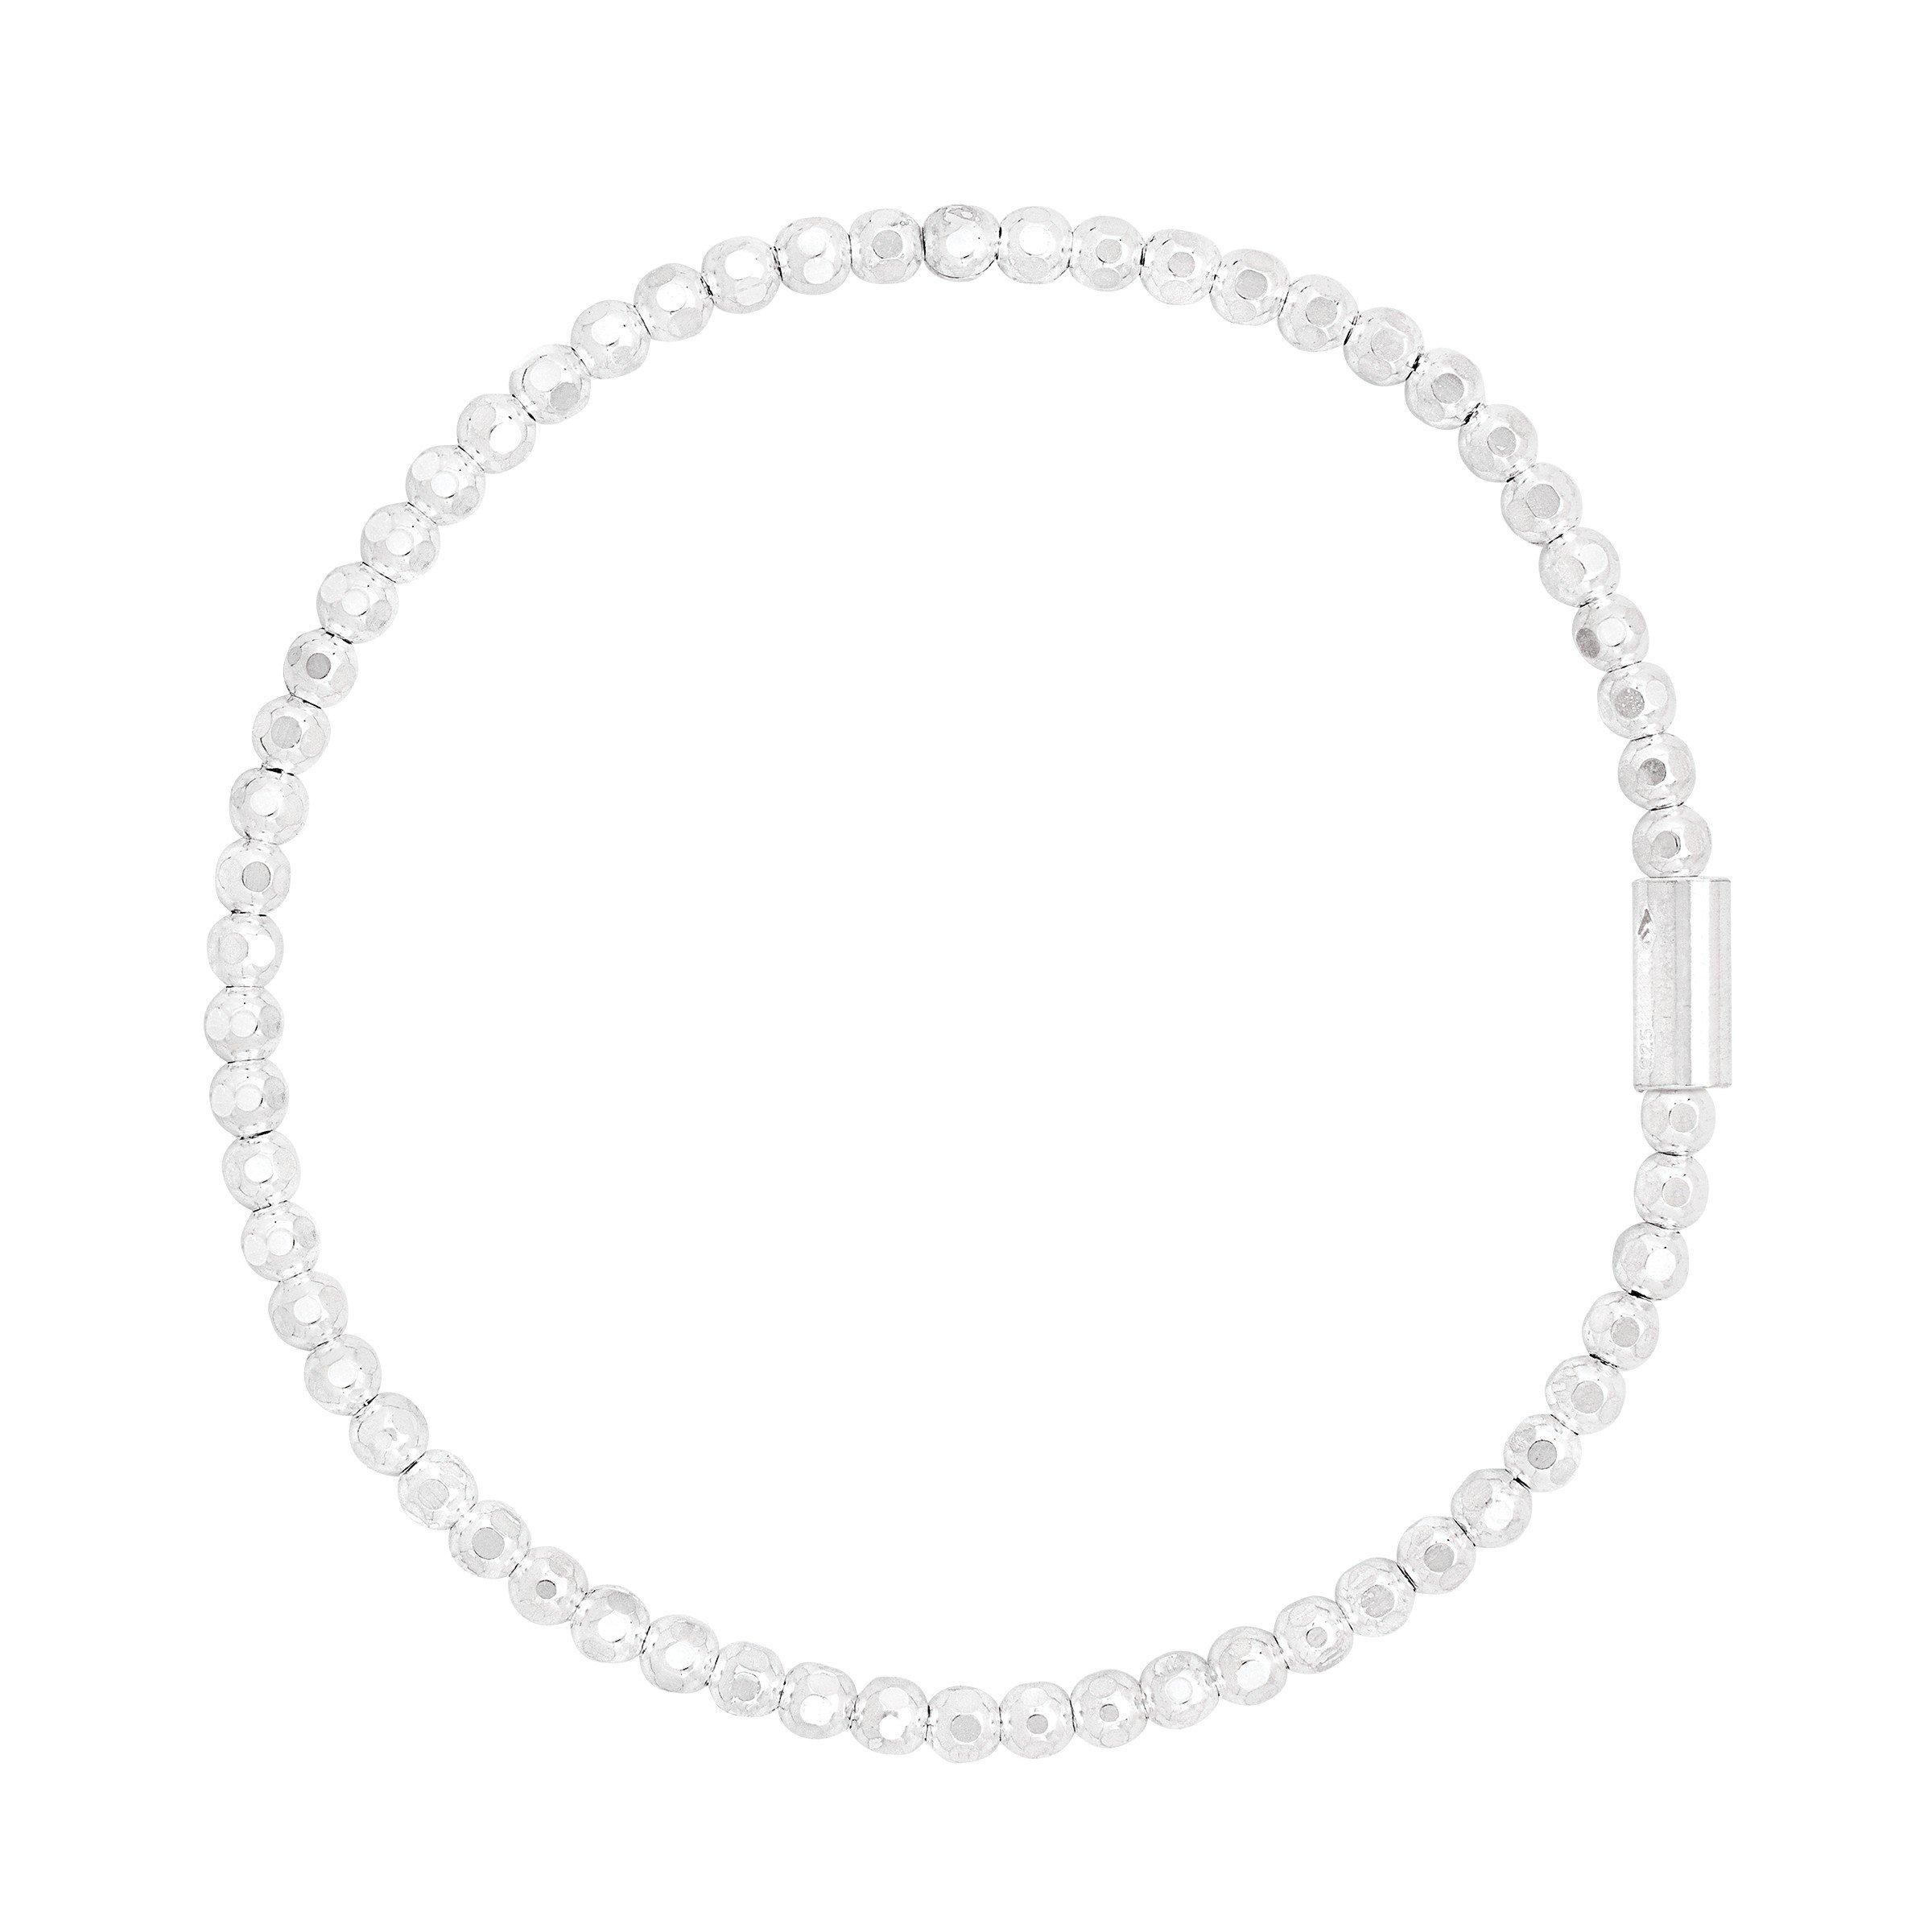 Silpada 'Charlotte' Sterling Silver Stretch Bracelet, 6.75'' by Silpada